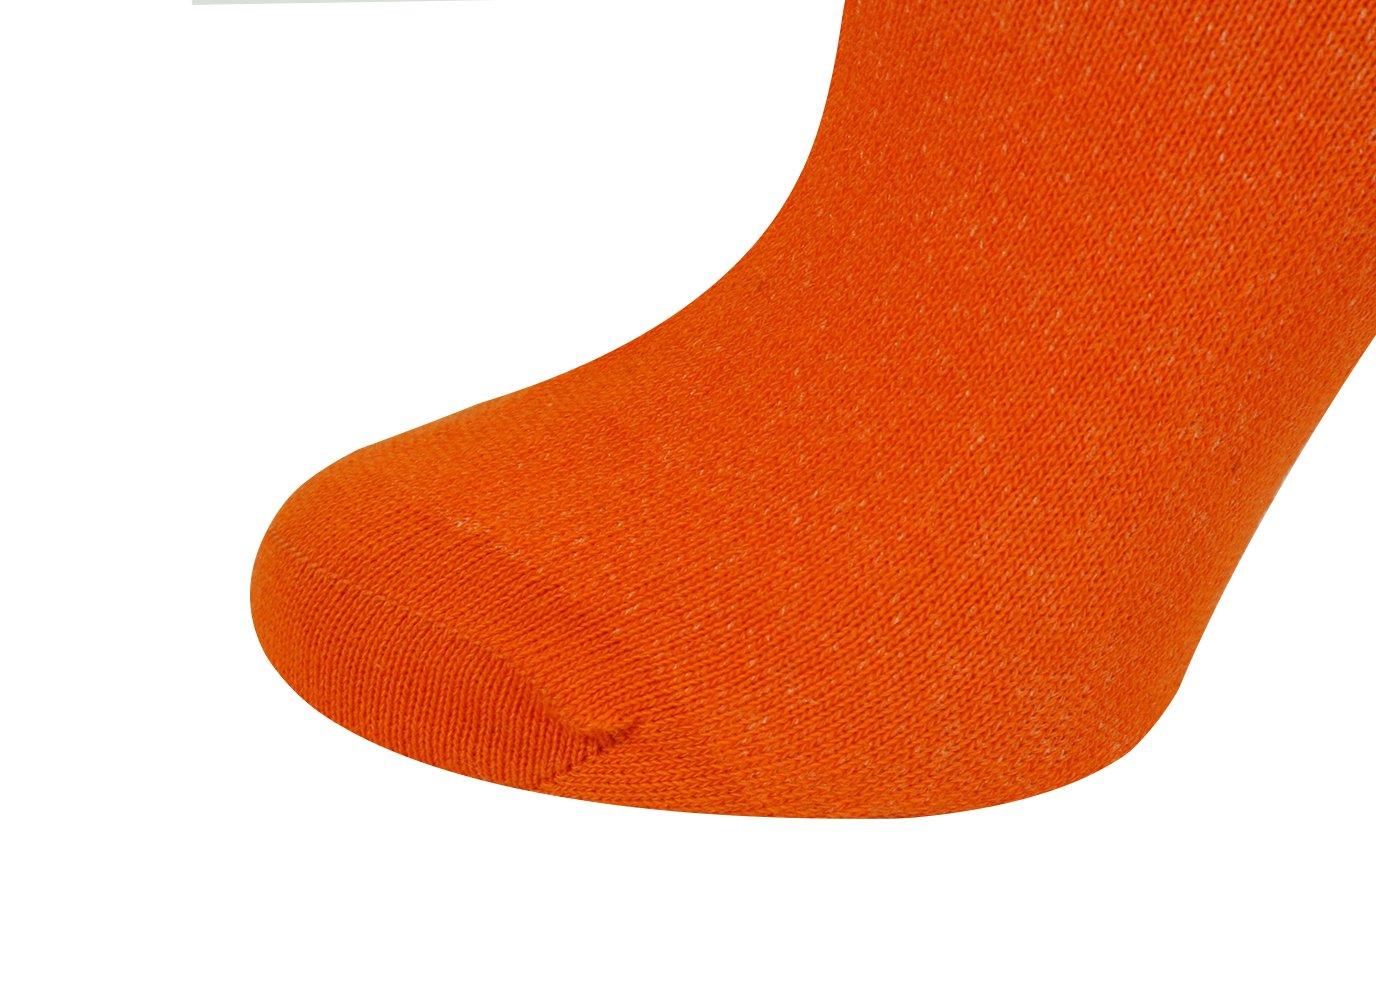 Mysocks Unisex Knee High Long Socks Orange,4-7 by MySocks (Image #5)